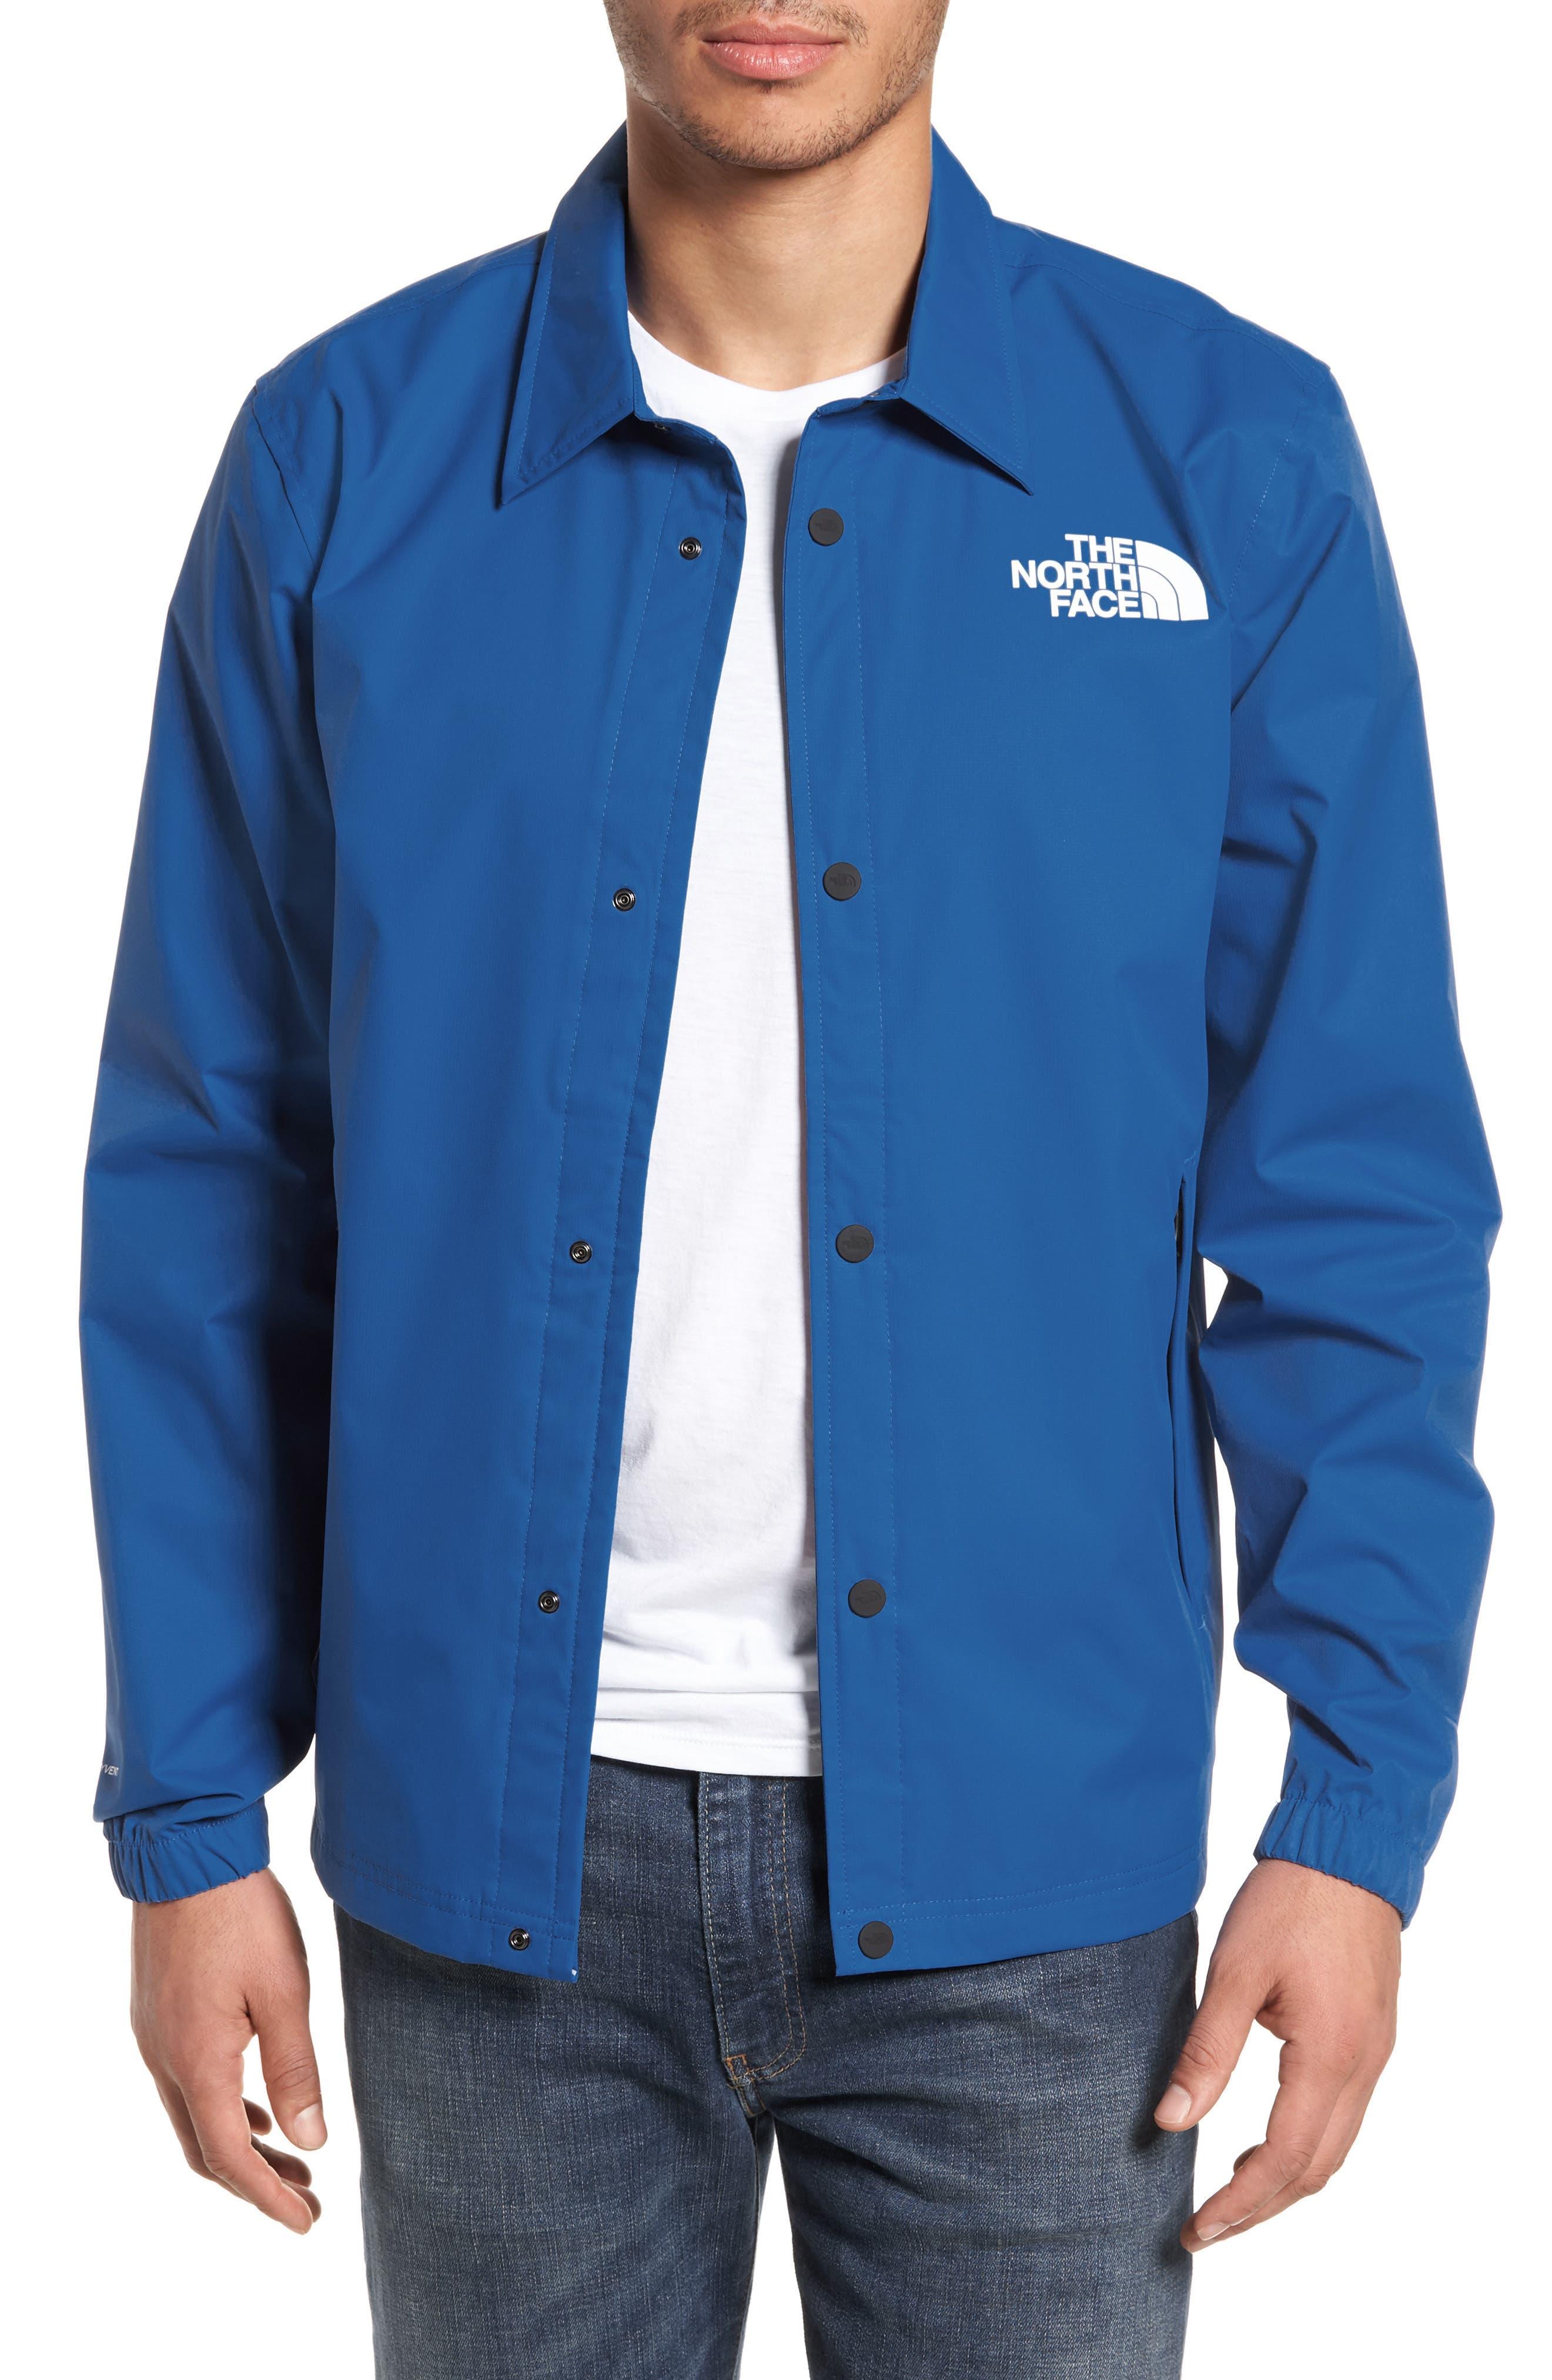 The North Face Coaches Rain Jacket